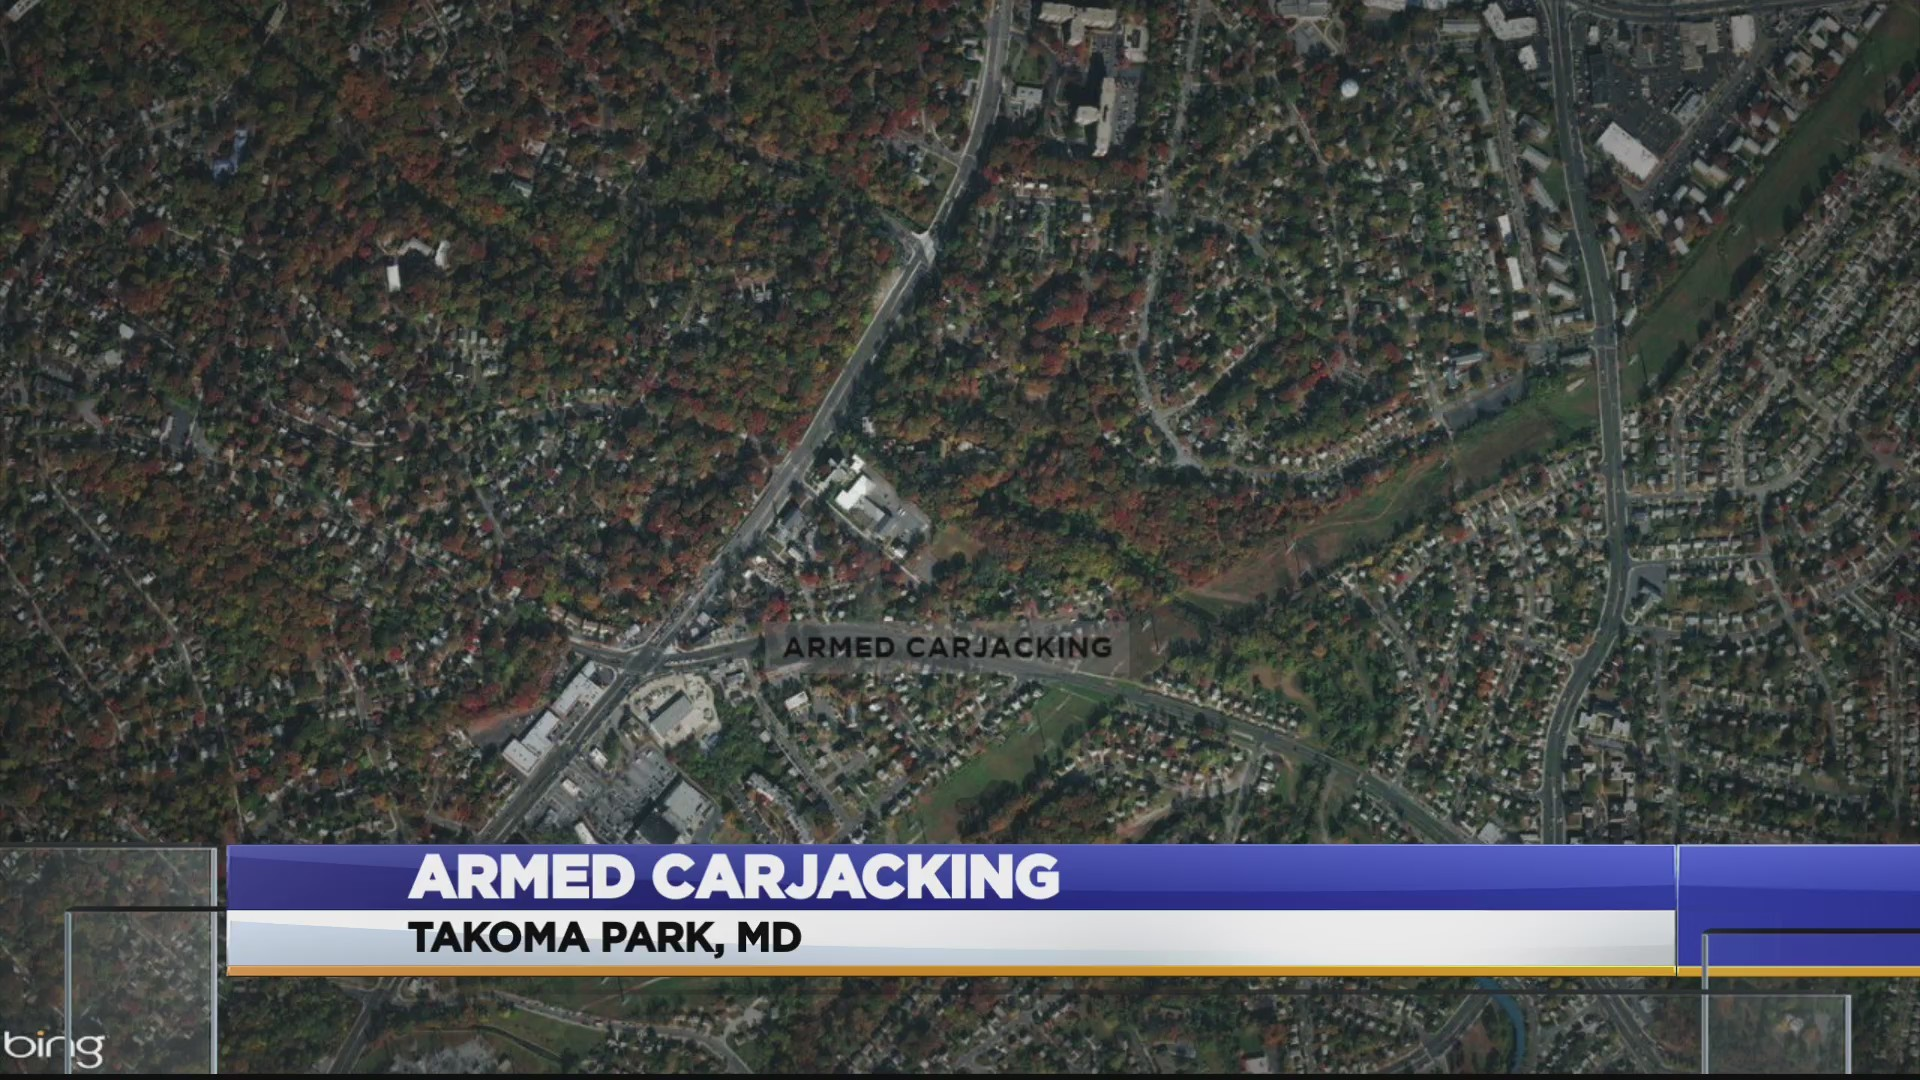 Armed_carjacking_0_20190312234542